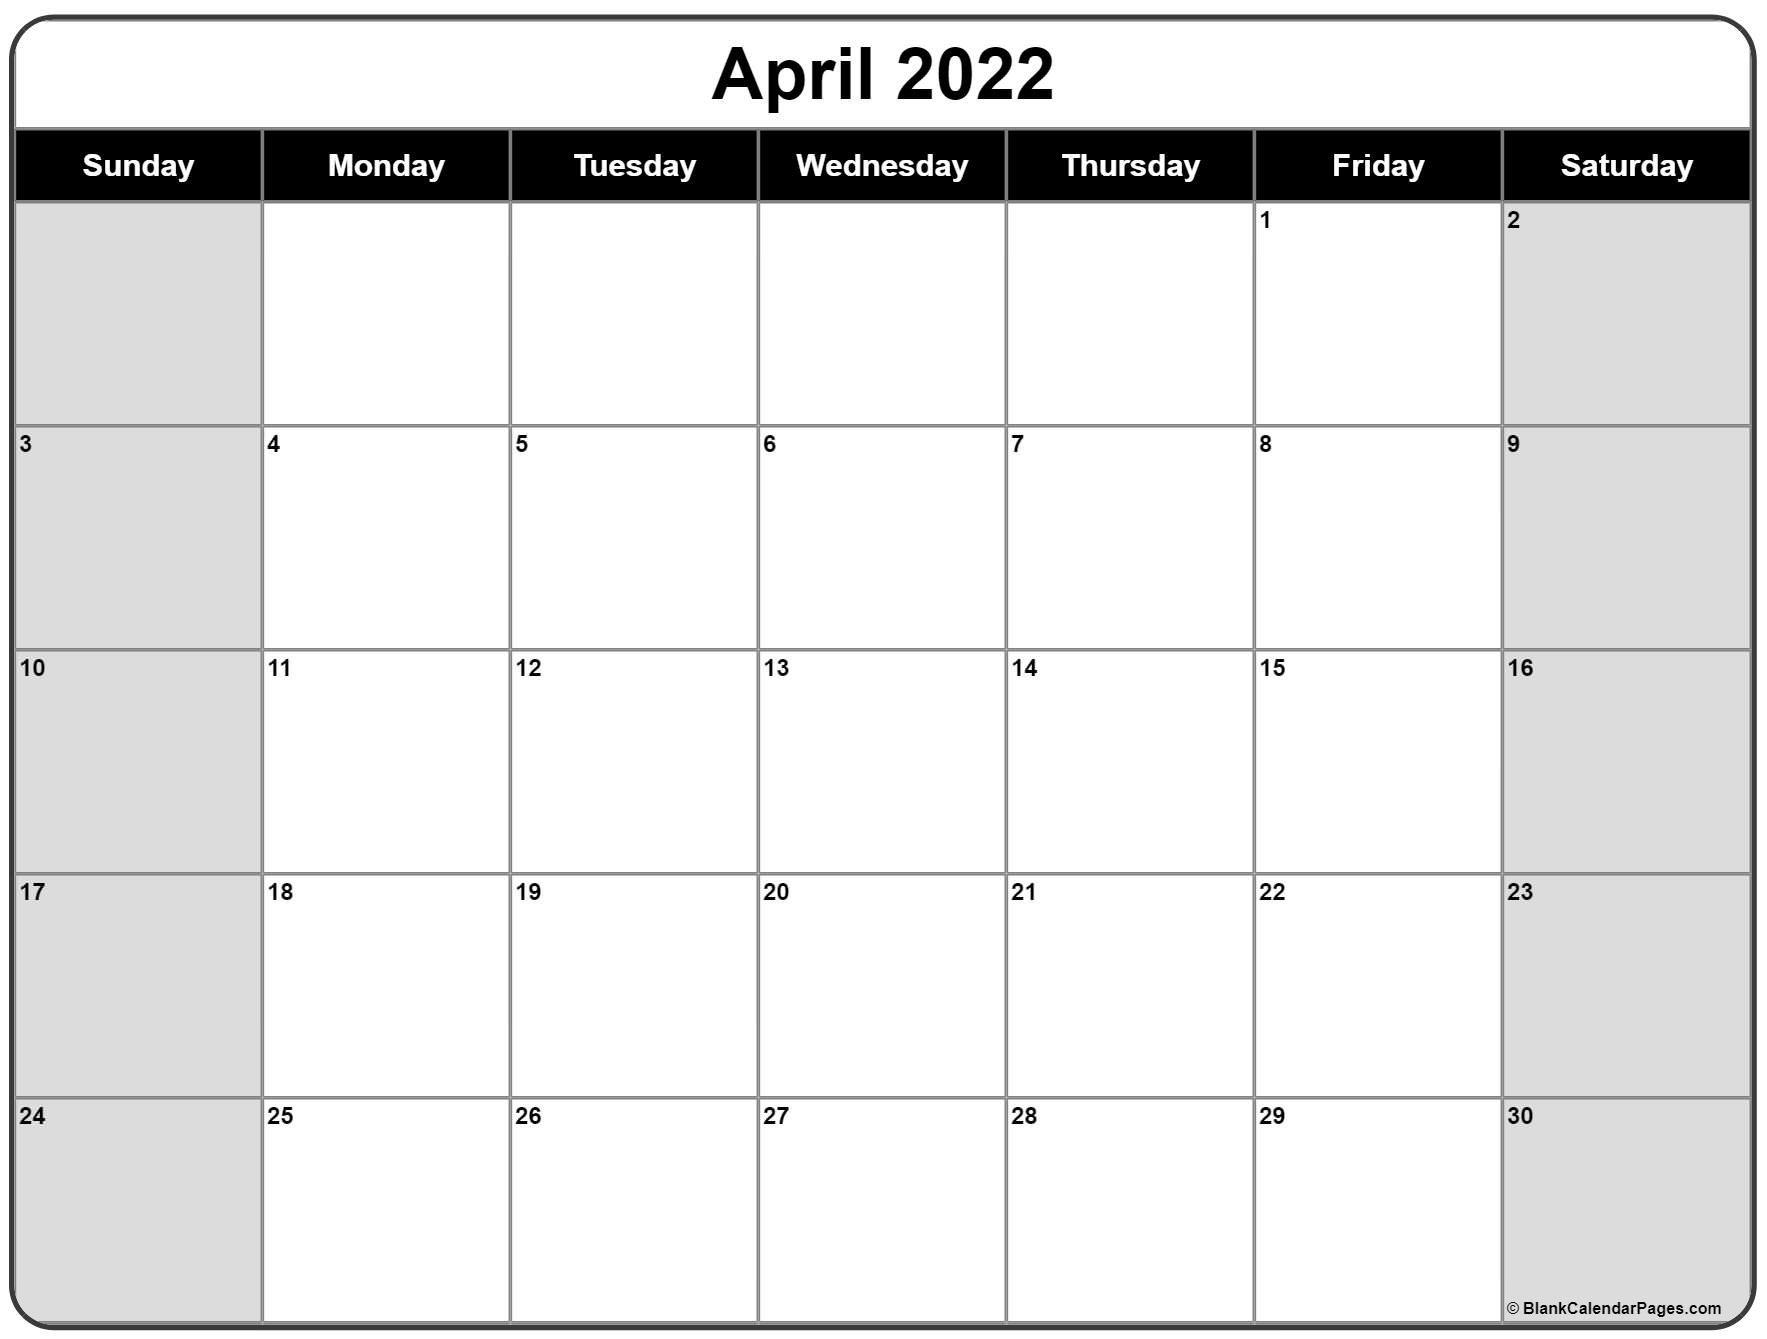 April 2022 Calendar | Free Printable Calendar Templates throughout Printable April 2022 Calendar Template Free Image